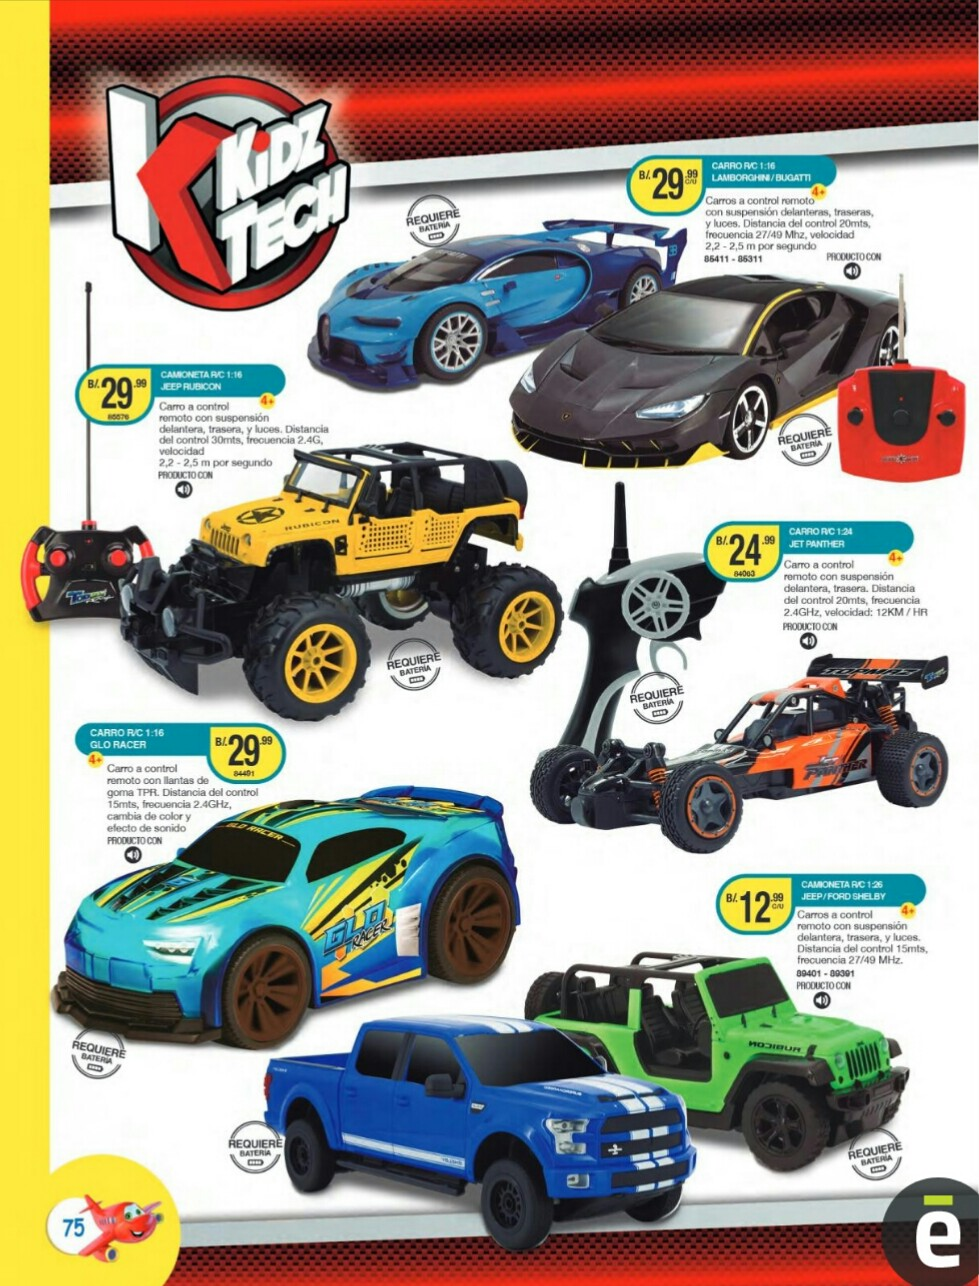 Catalogo juguetes Titan Toys 2019 p75